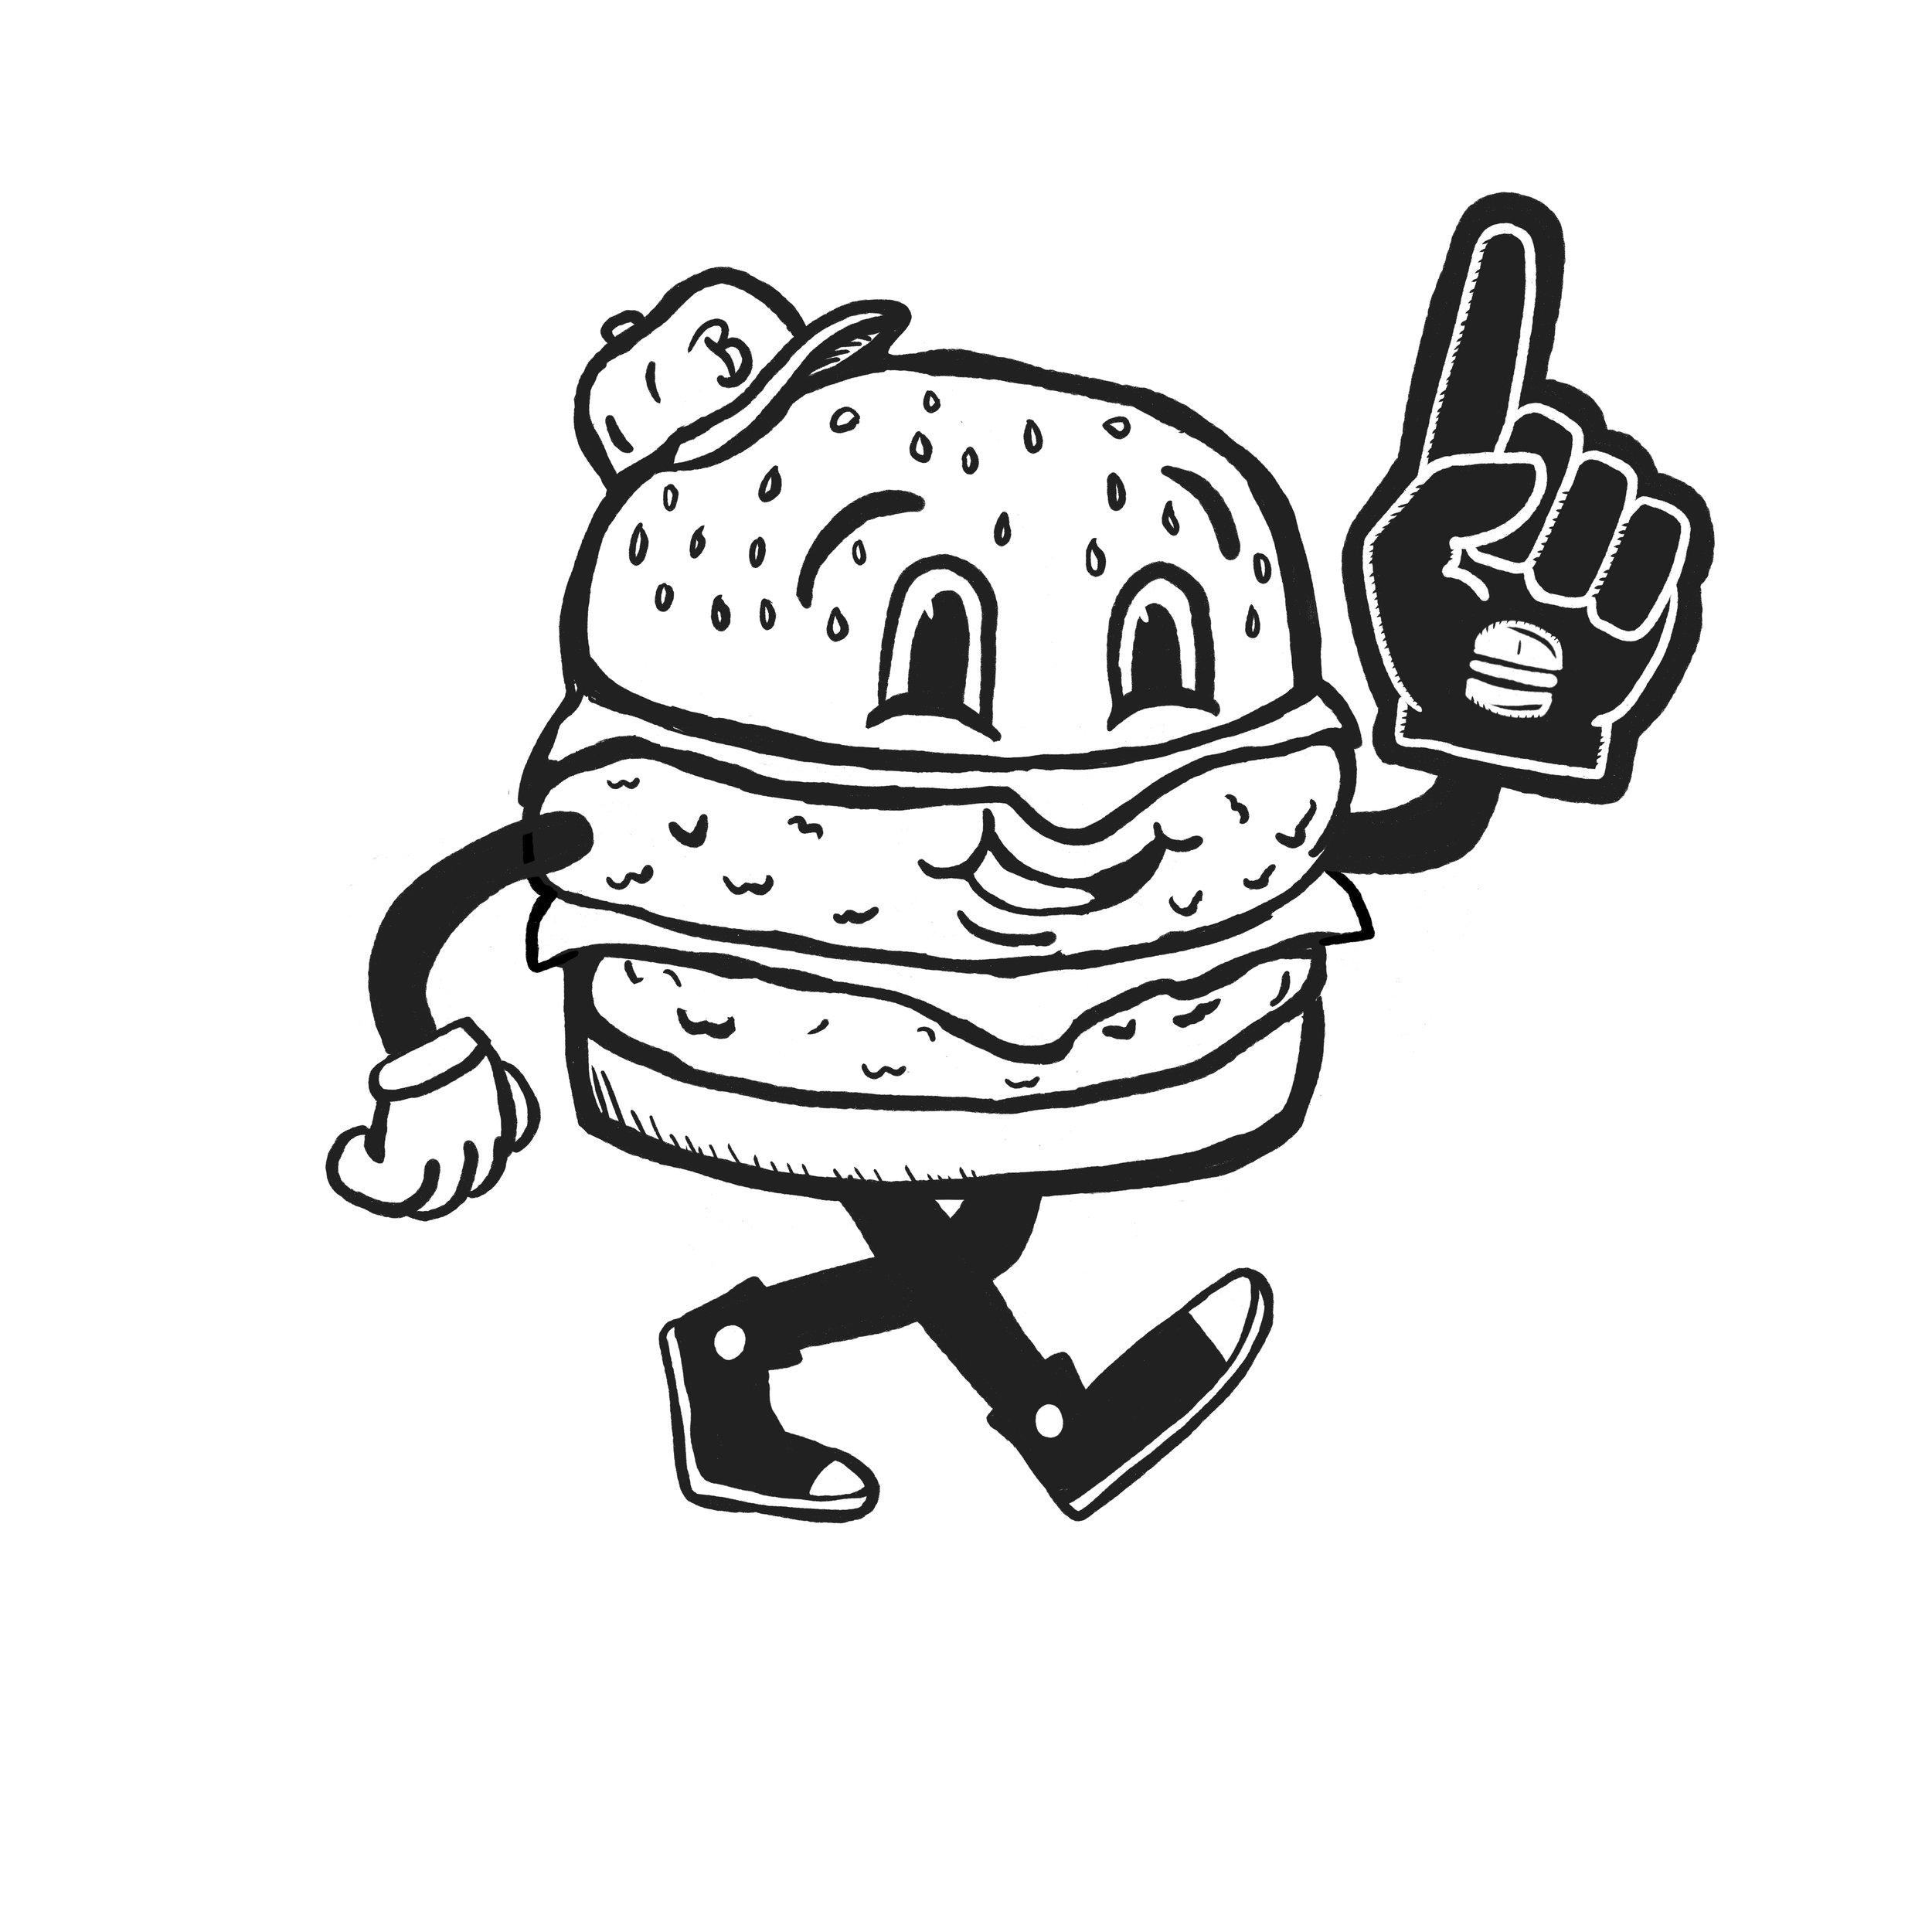 Burger_Character_.jpg